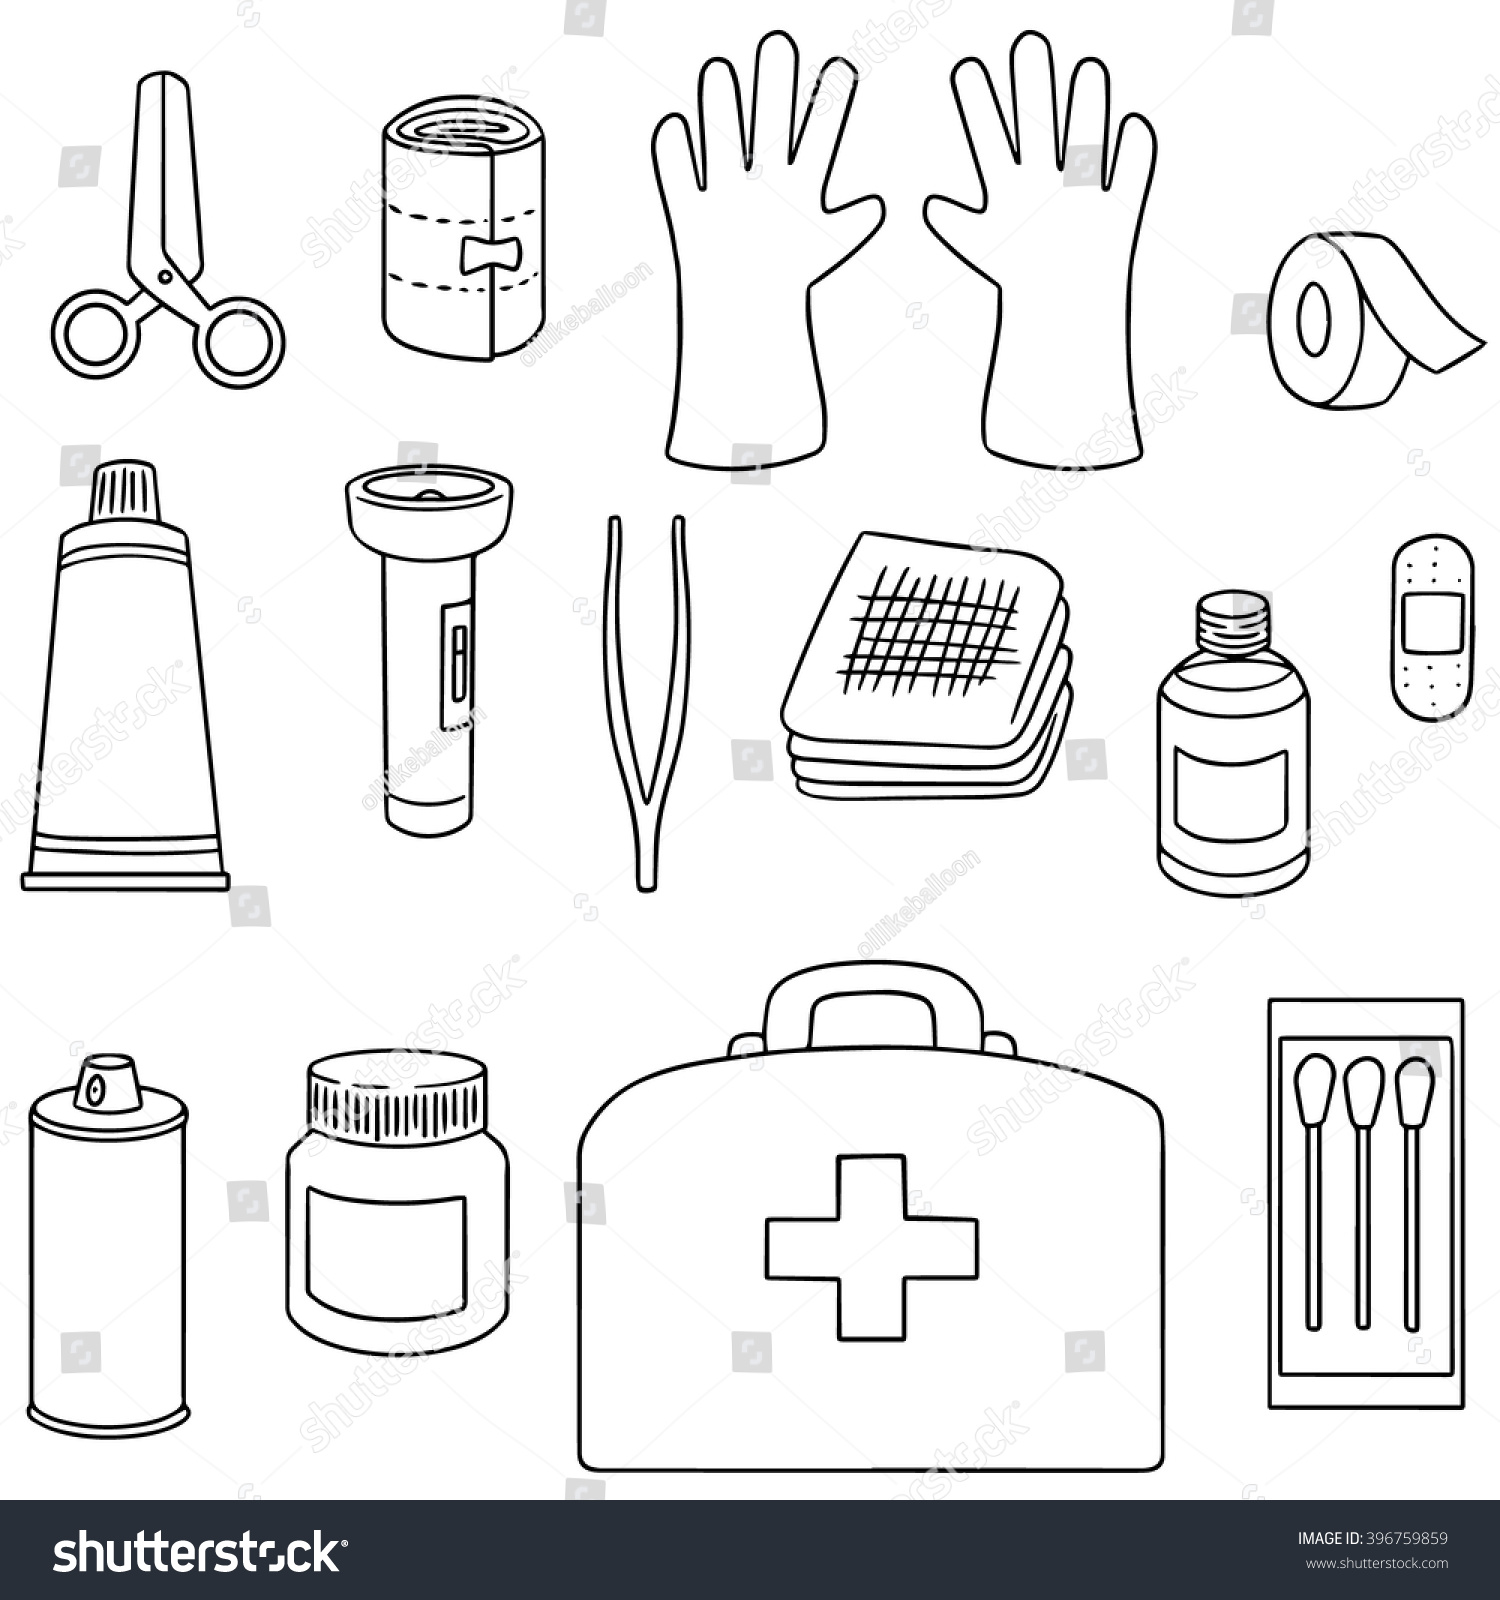 vector set first aid kit stock vector 396759859 shutterstock